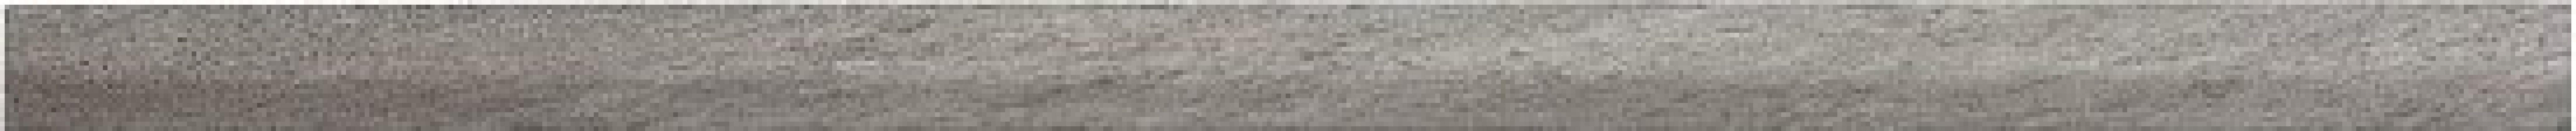 Brave Grey Spigolo 10 mm 1x20